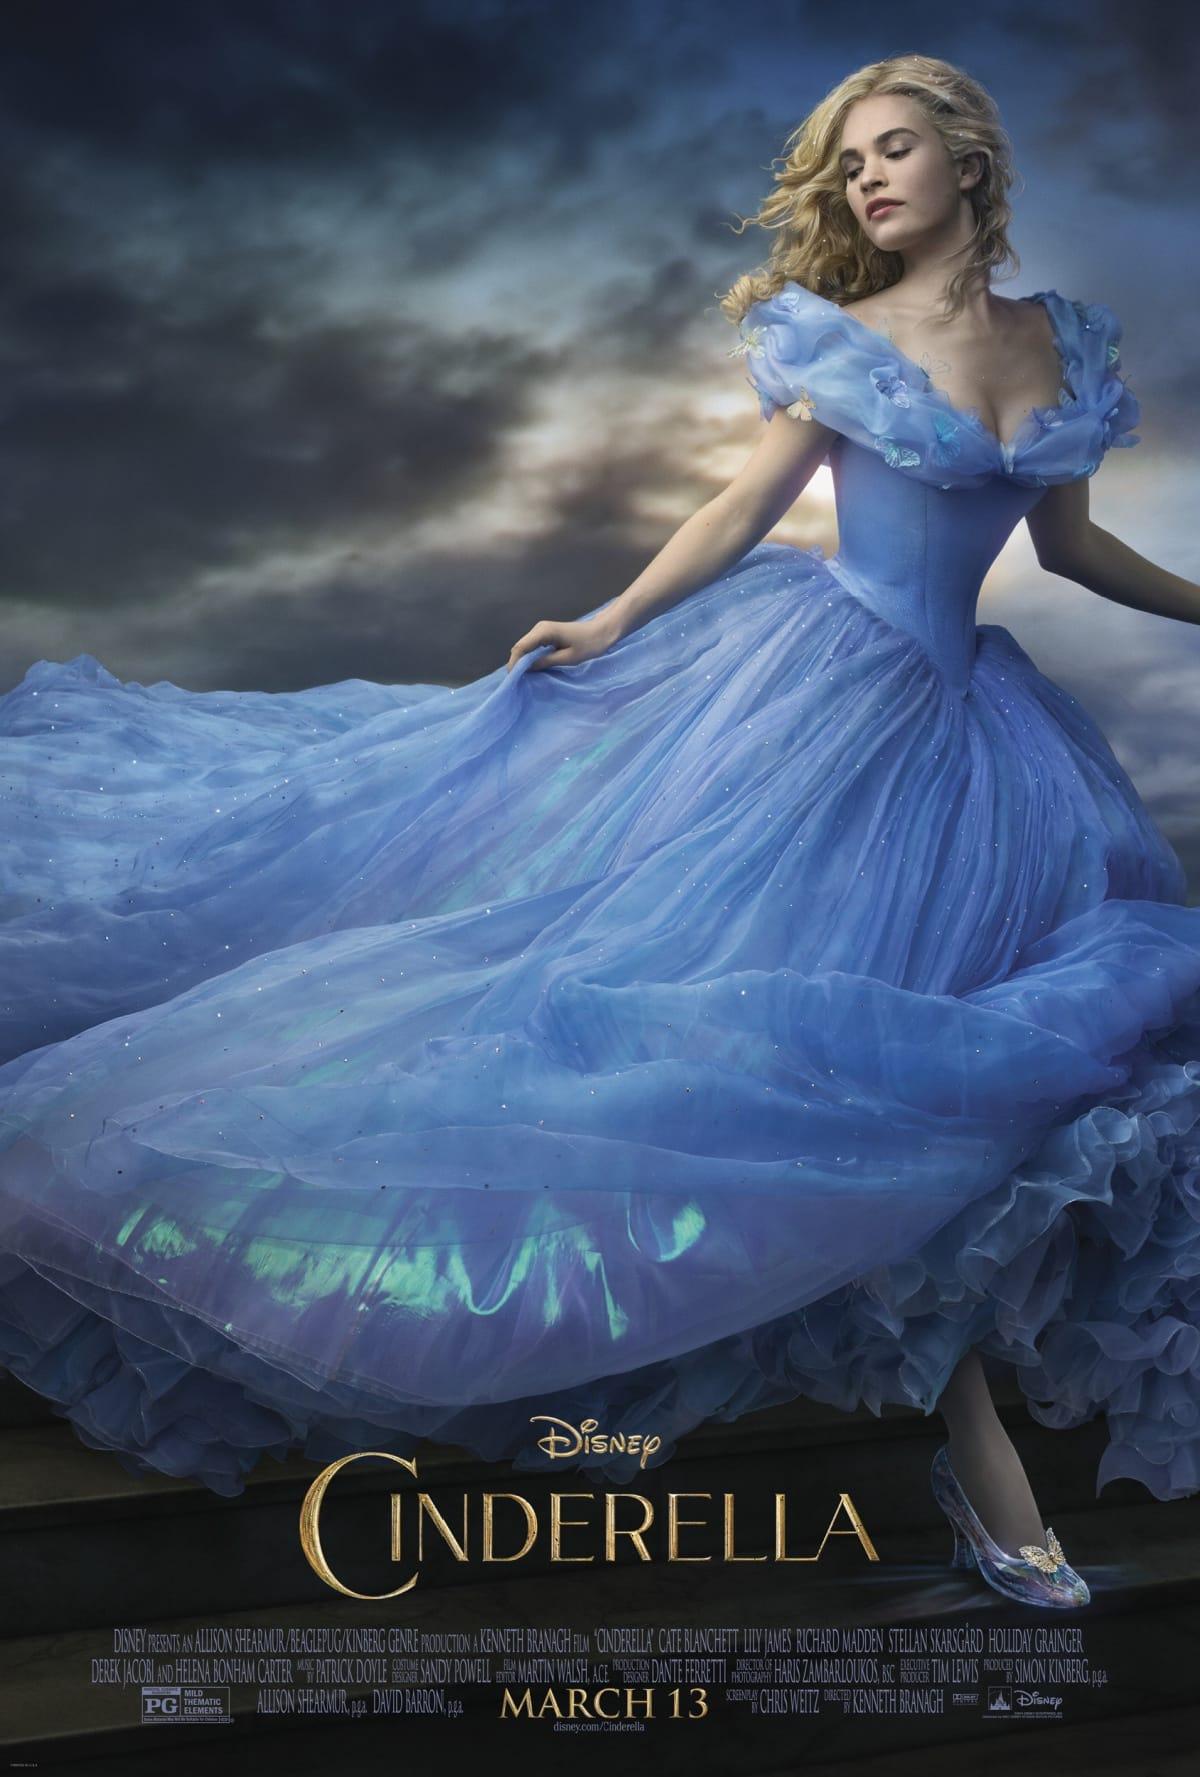 Movie poster for the live action Disney princess movie Cinderella